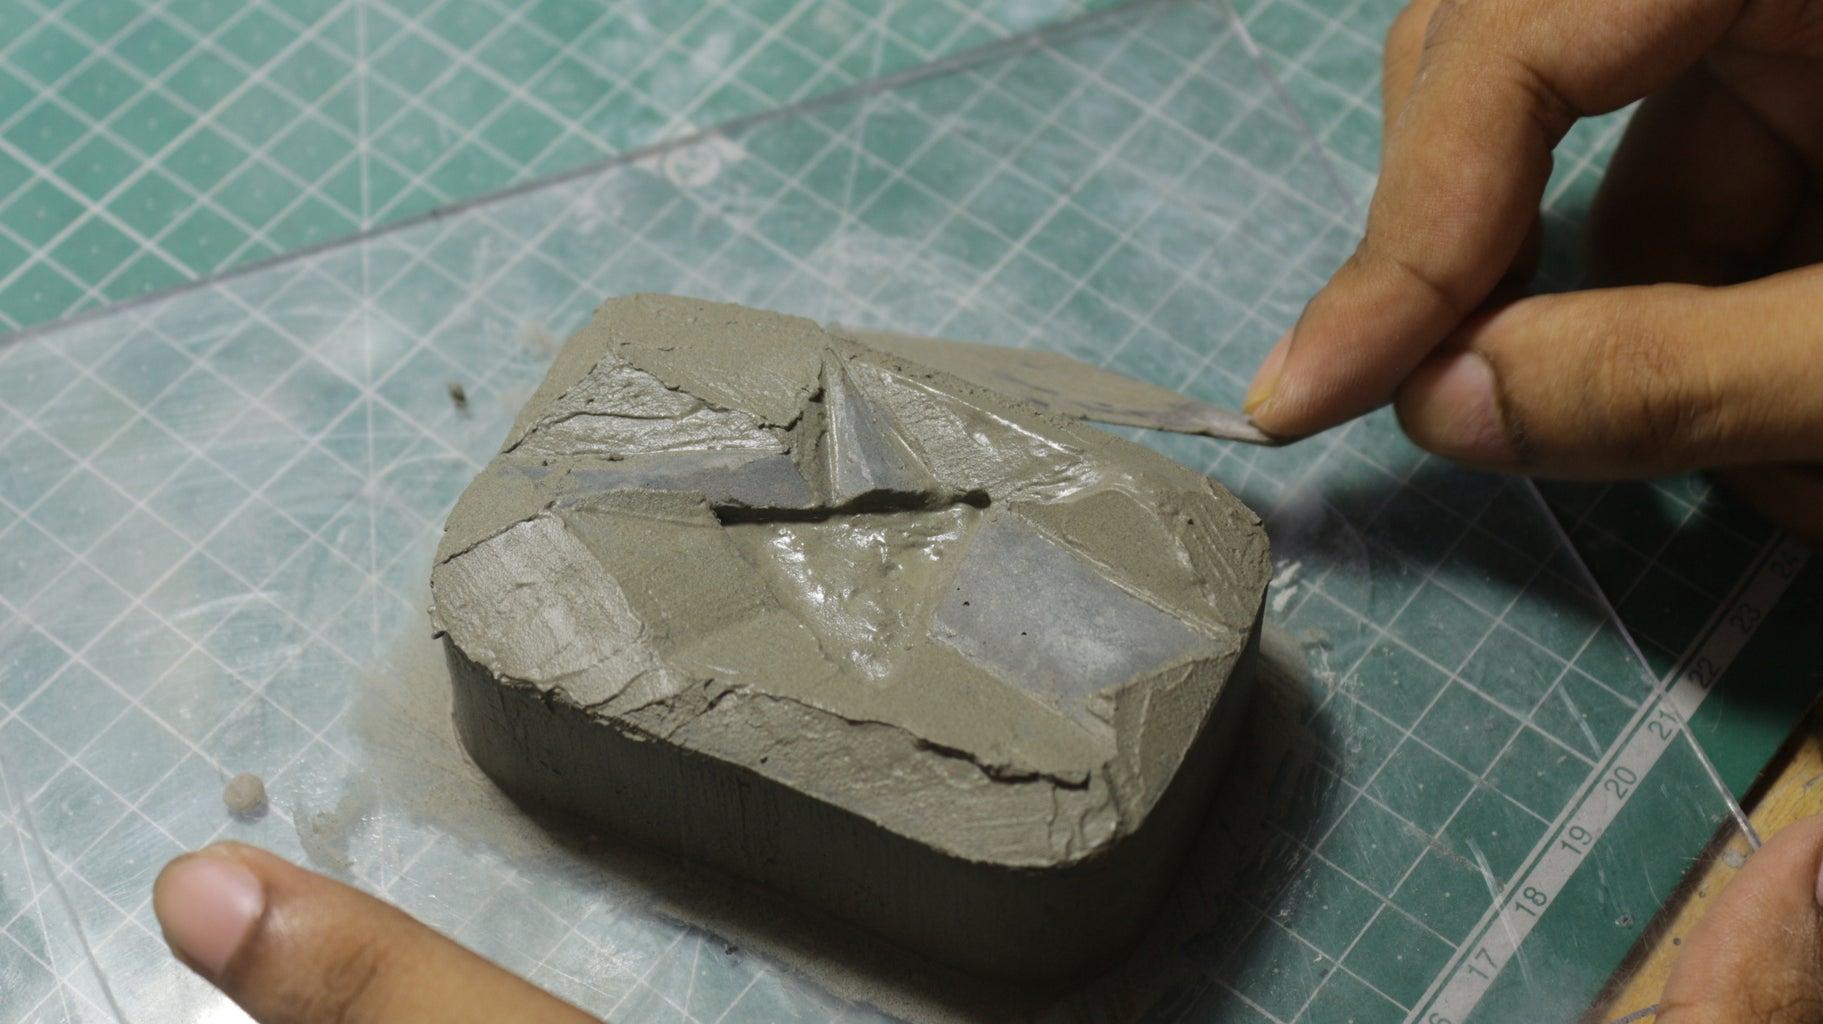 Demoulding the Piece